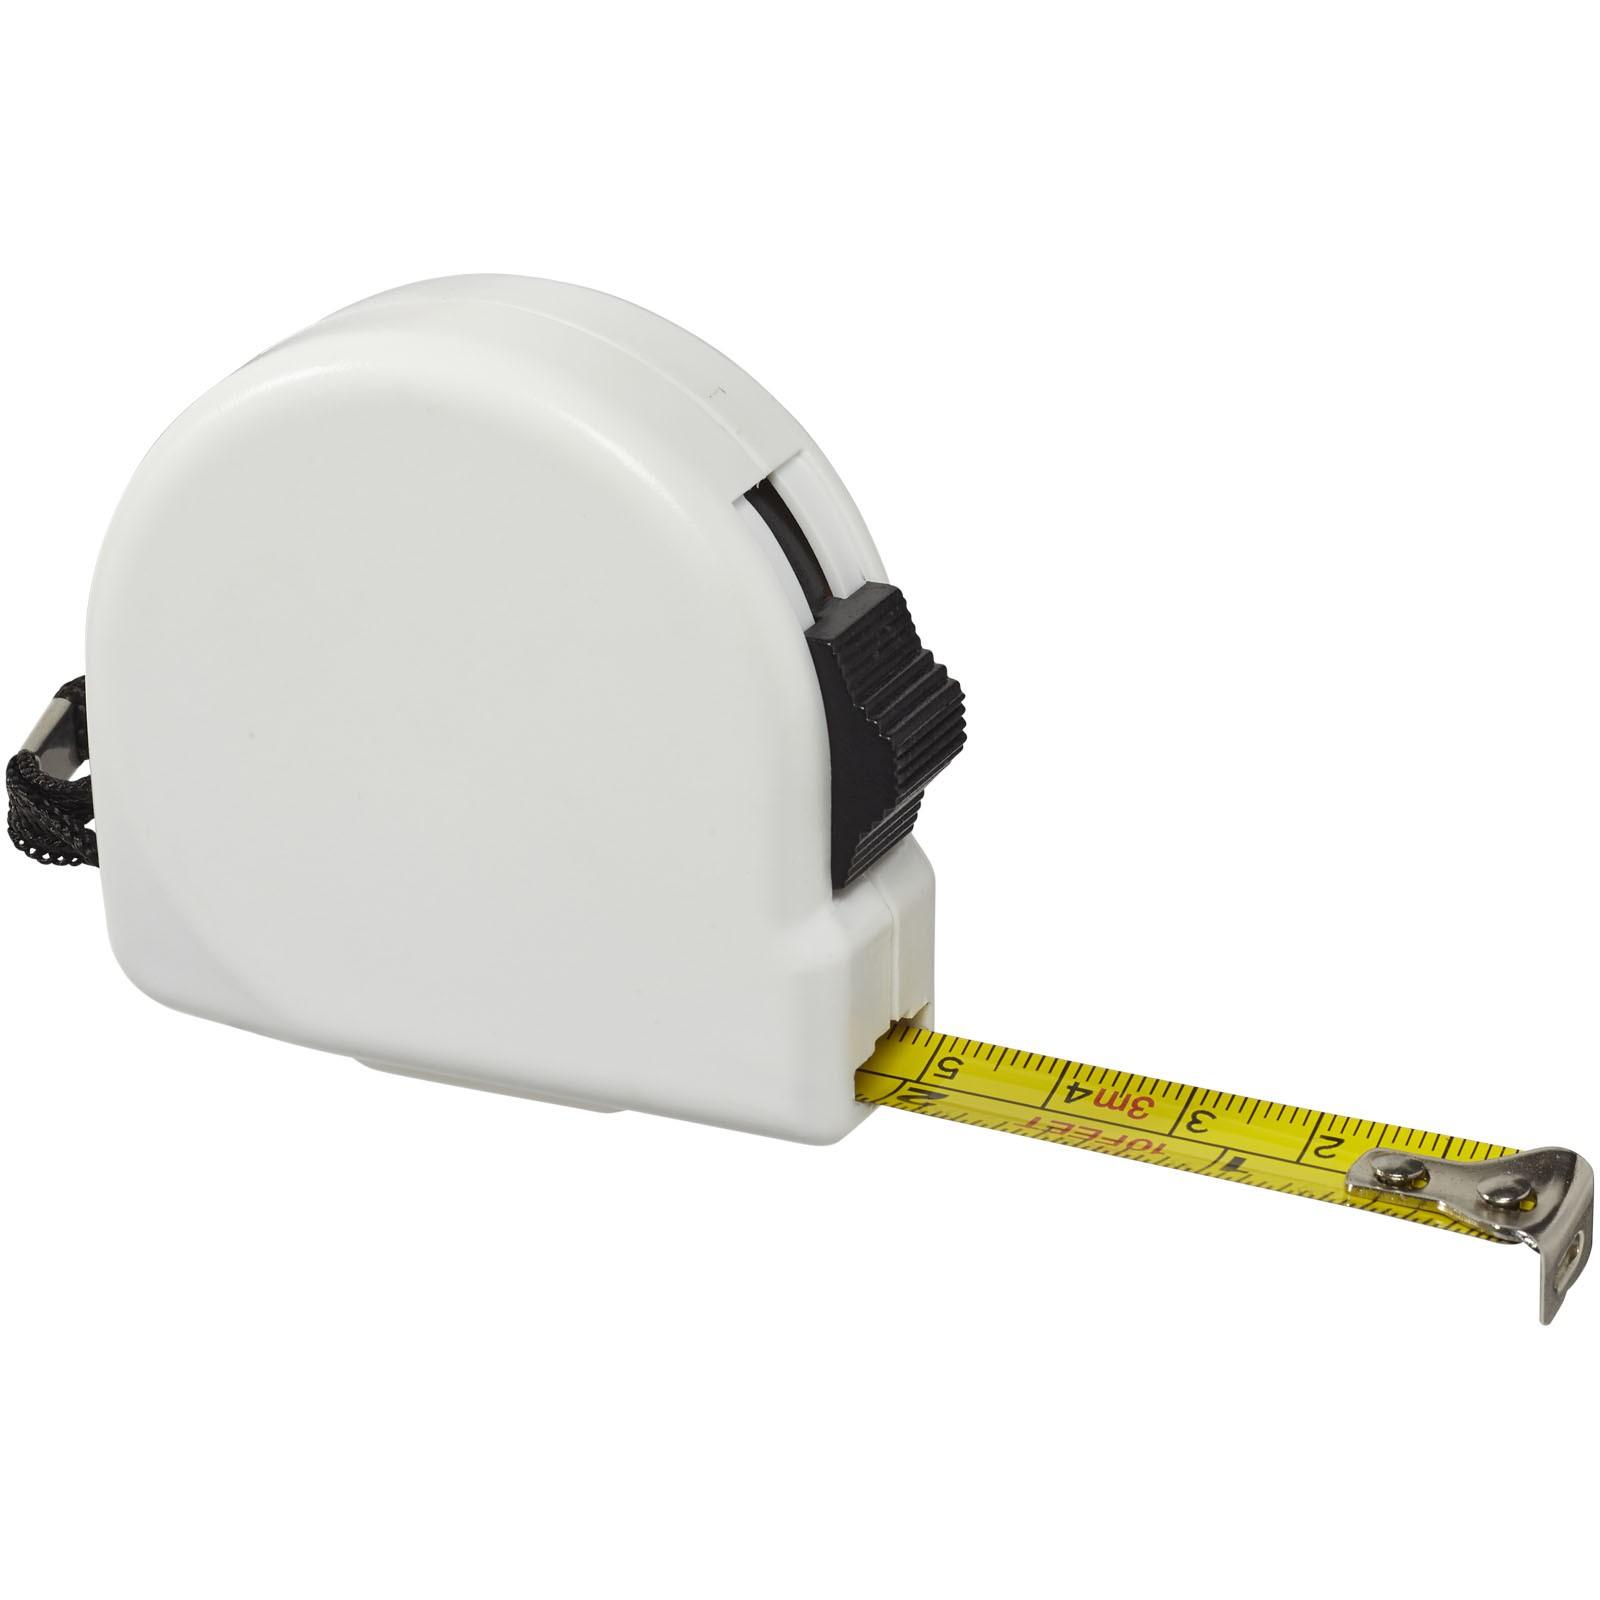 Clark 3 metre measuring tape - White